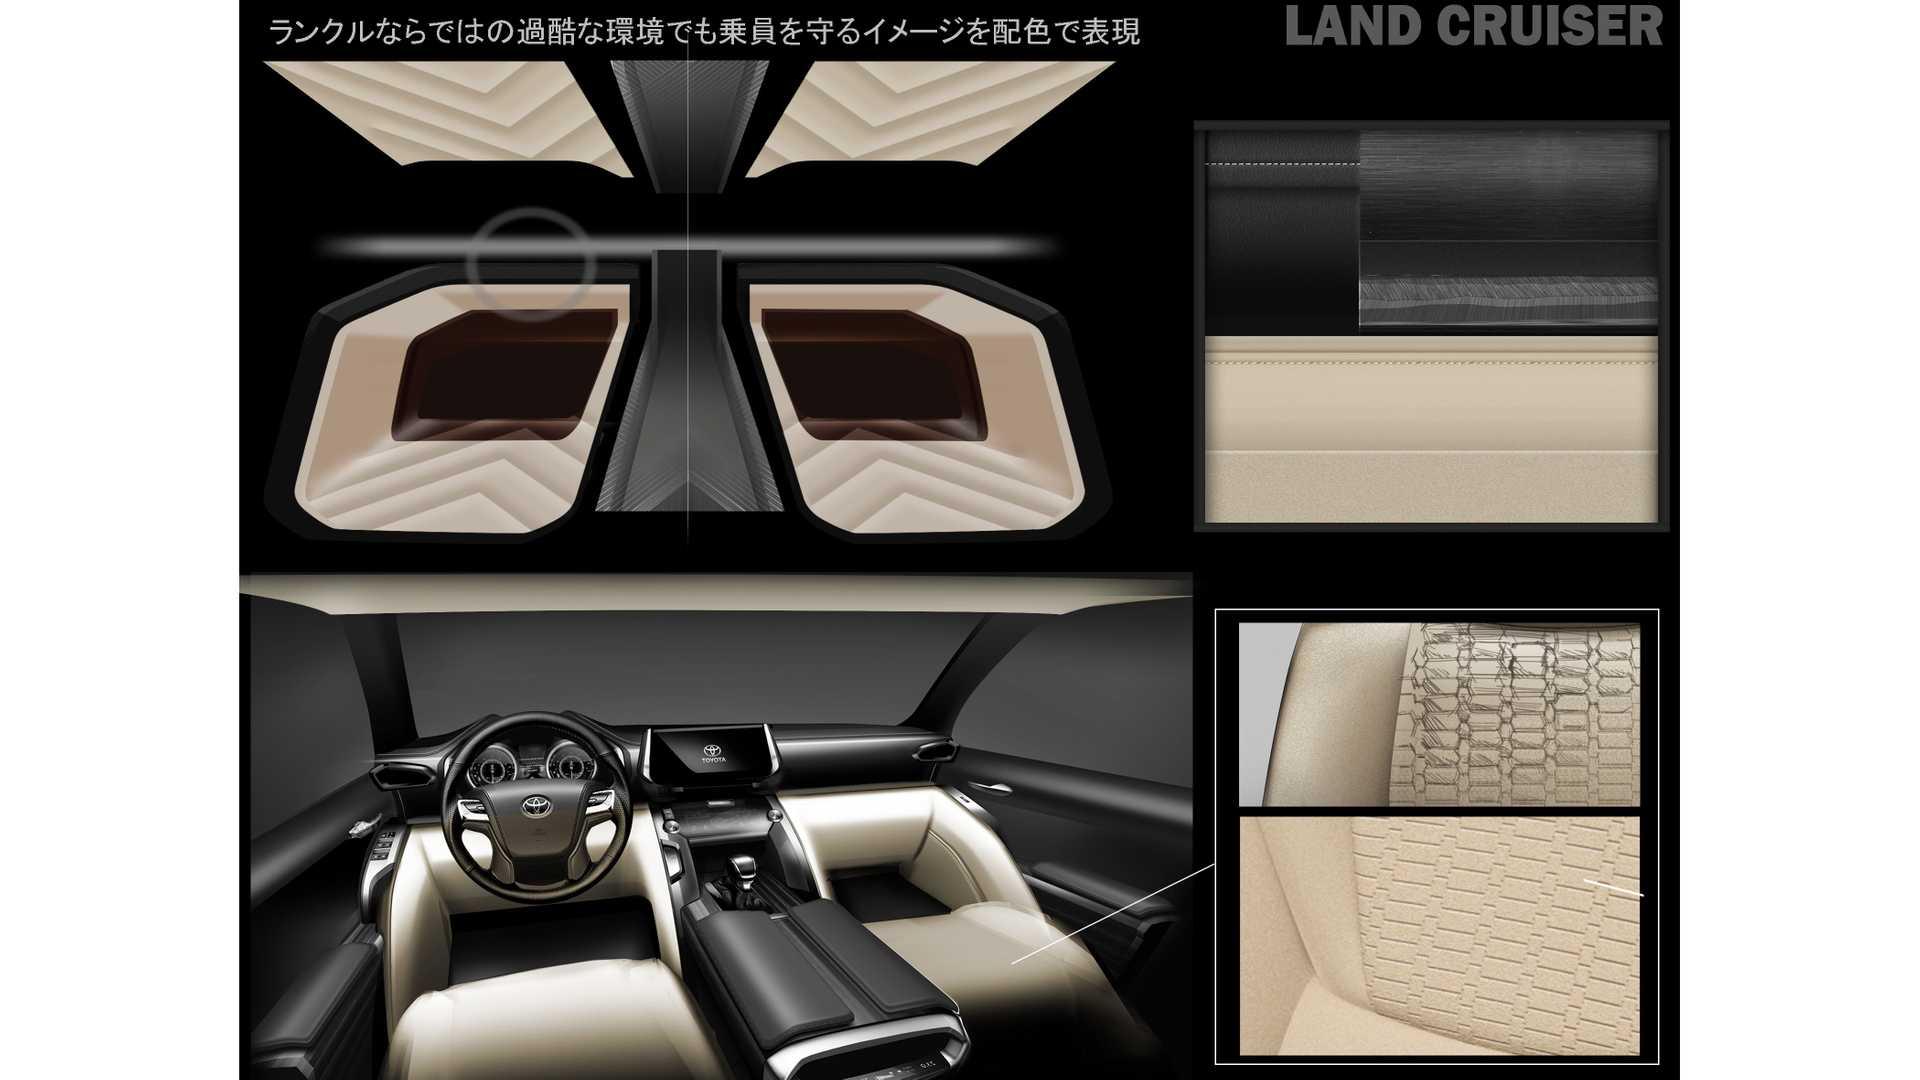 Toyota-Land-Cruiser-design-sketches-31